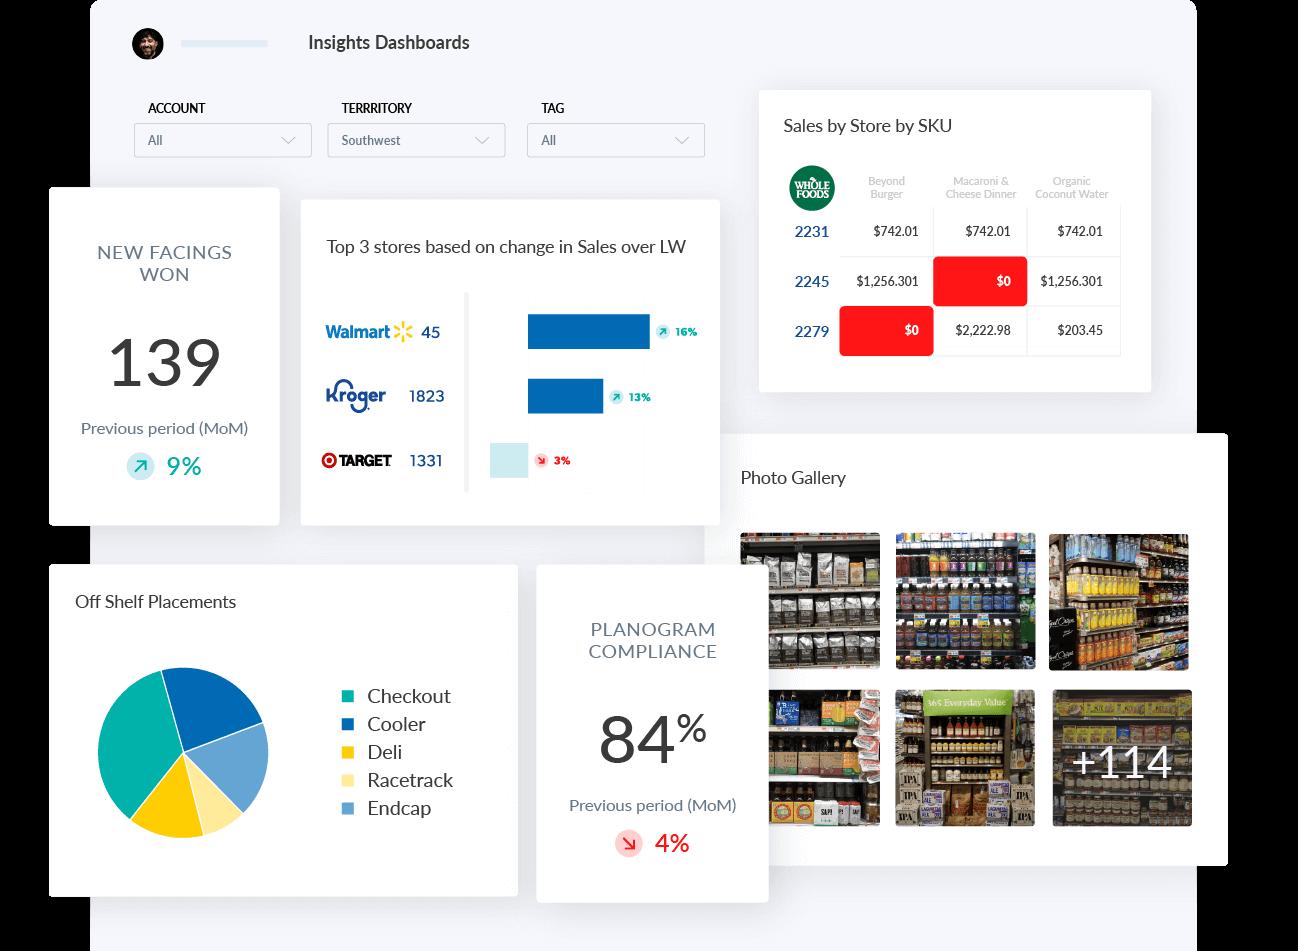 Merchandising Insights Dashboards